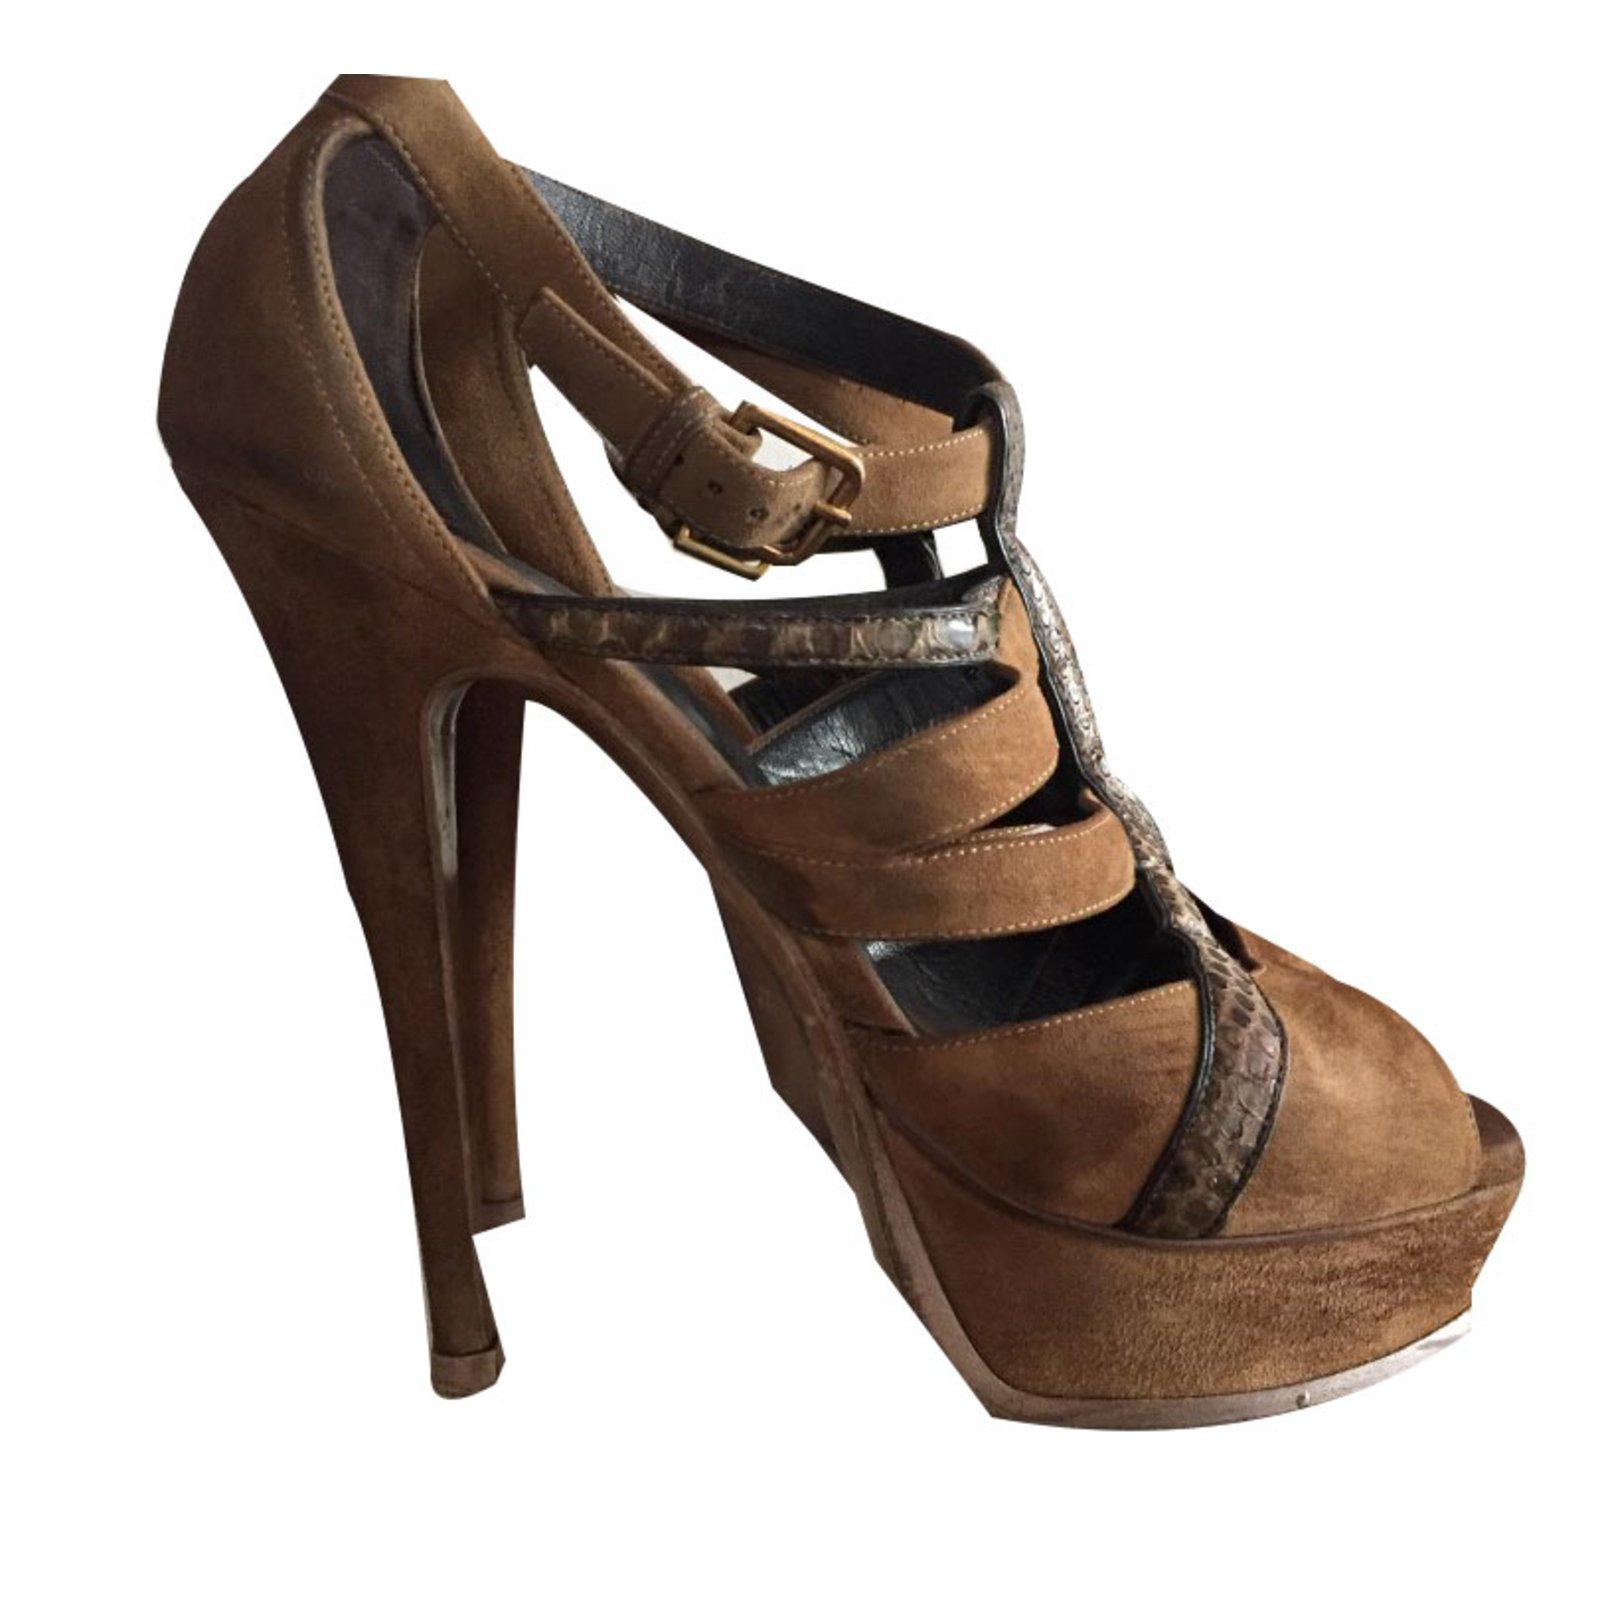 cc76cebb9df Yves Saint Laurent Sandals Sandals Suede Brown ref.59106 - Joli Closet